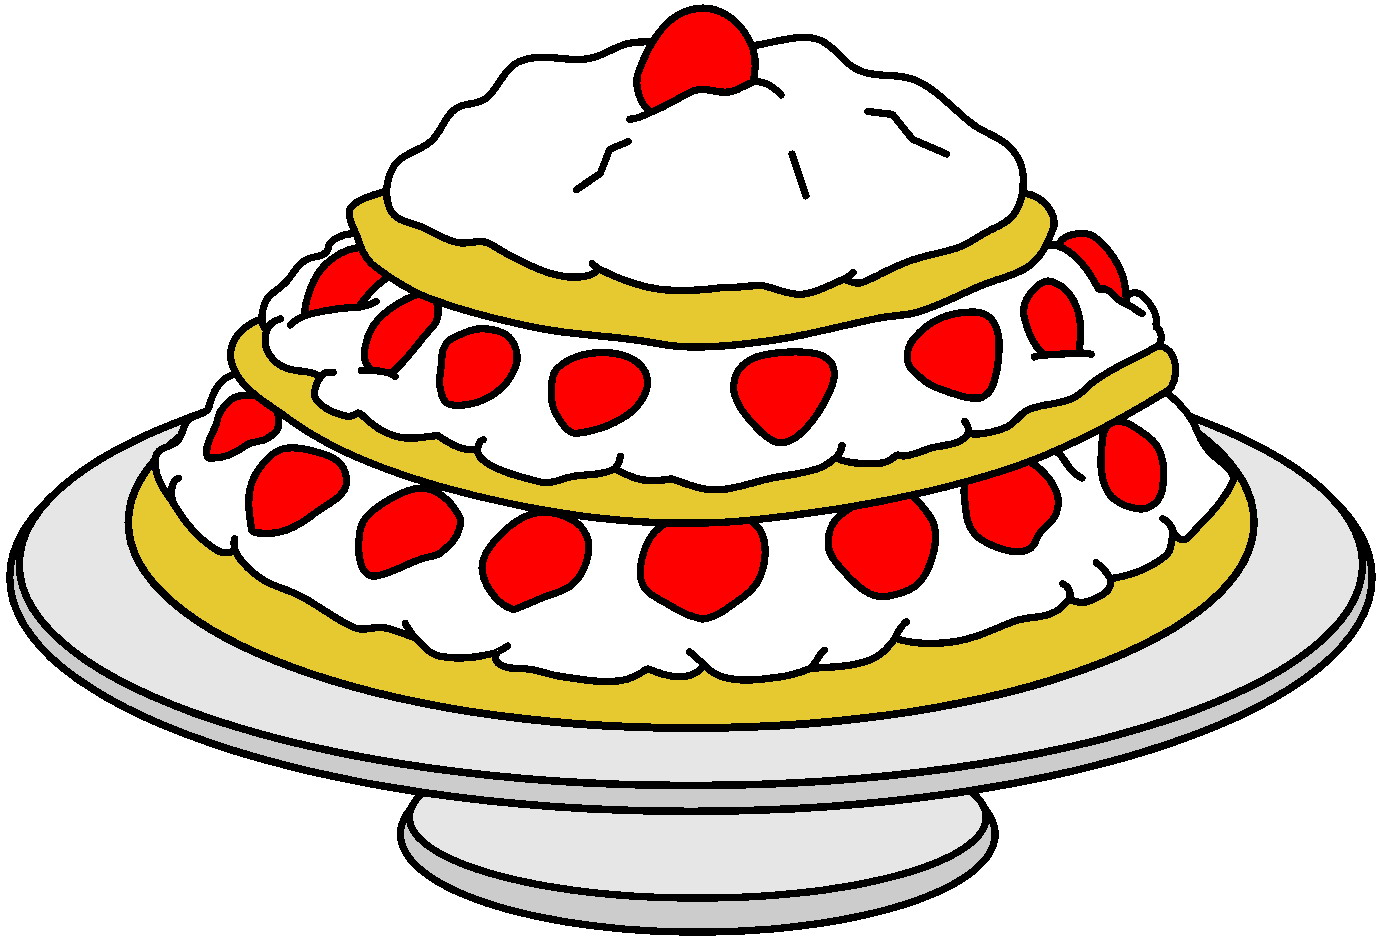 clipart taart Taart Cliparts » Animaatjes.nl clipart taart